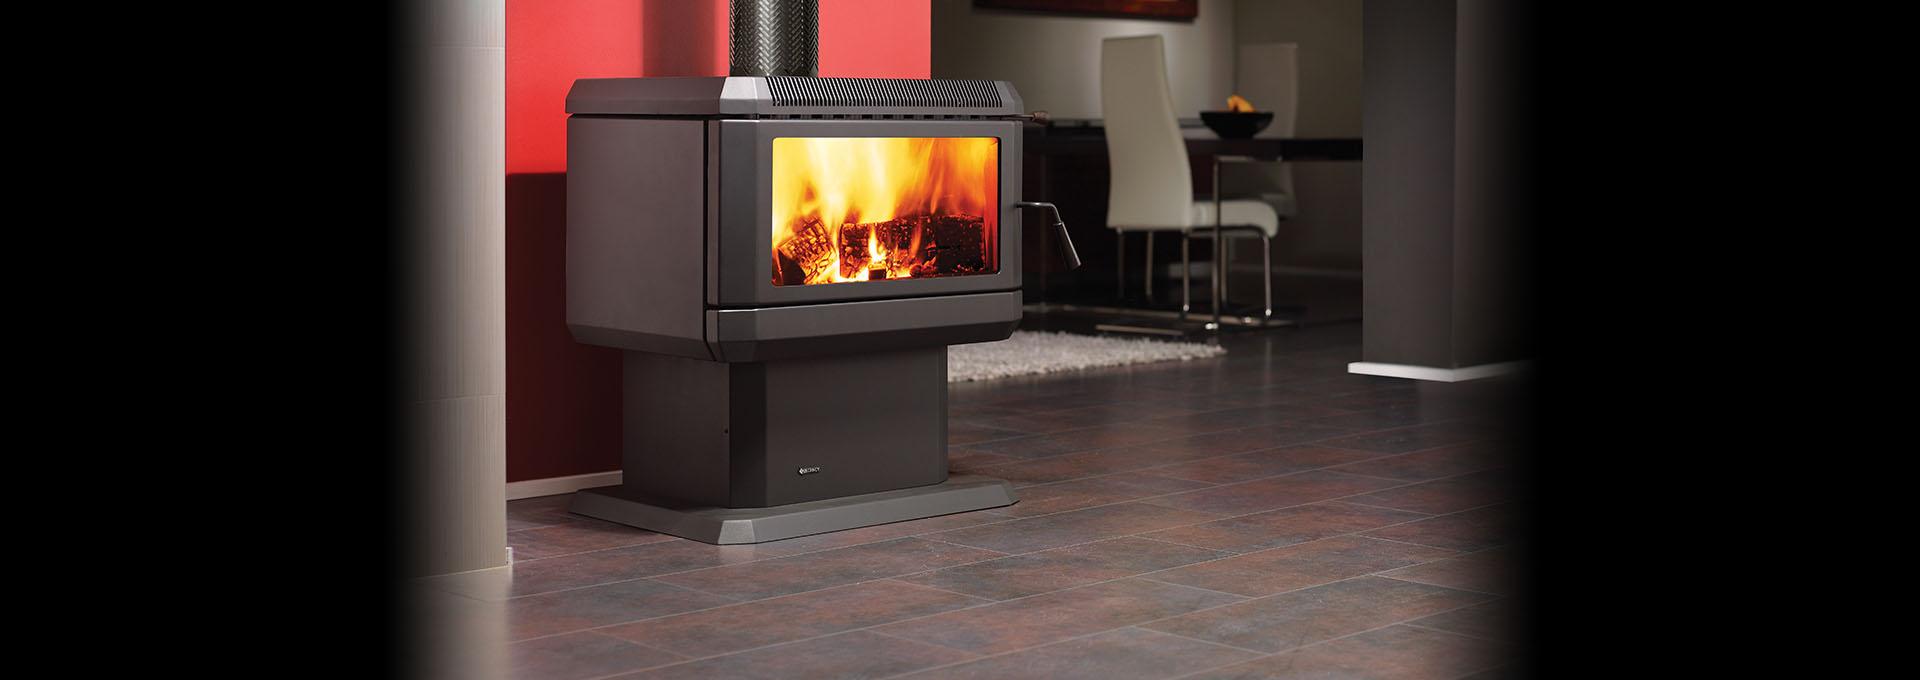 hume wood freestanding heater wood freestanding heaters